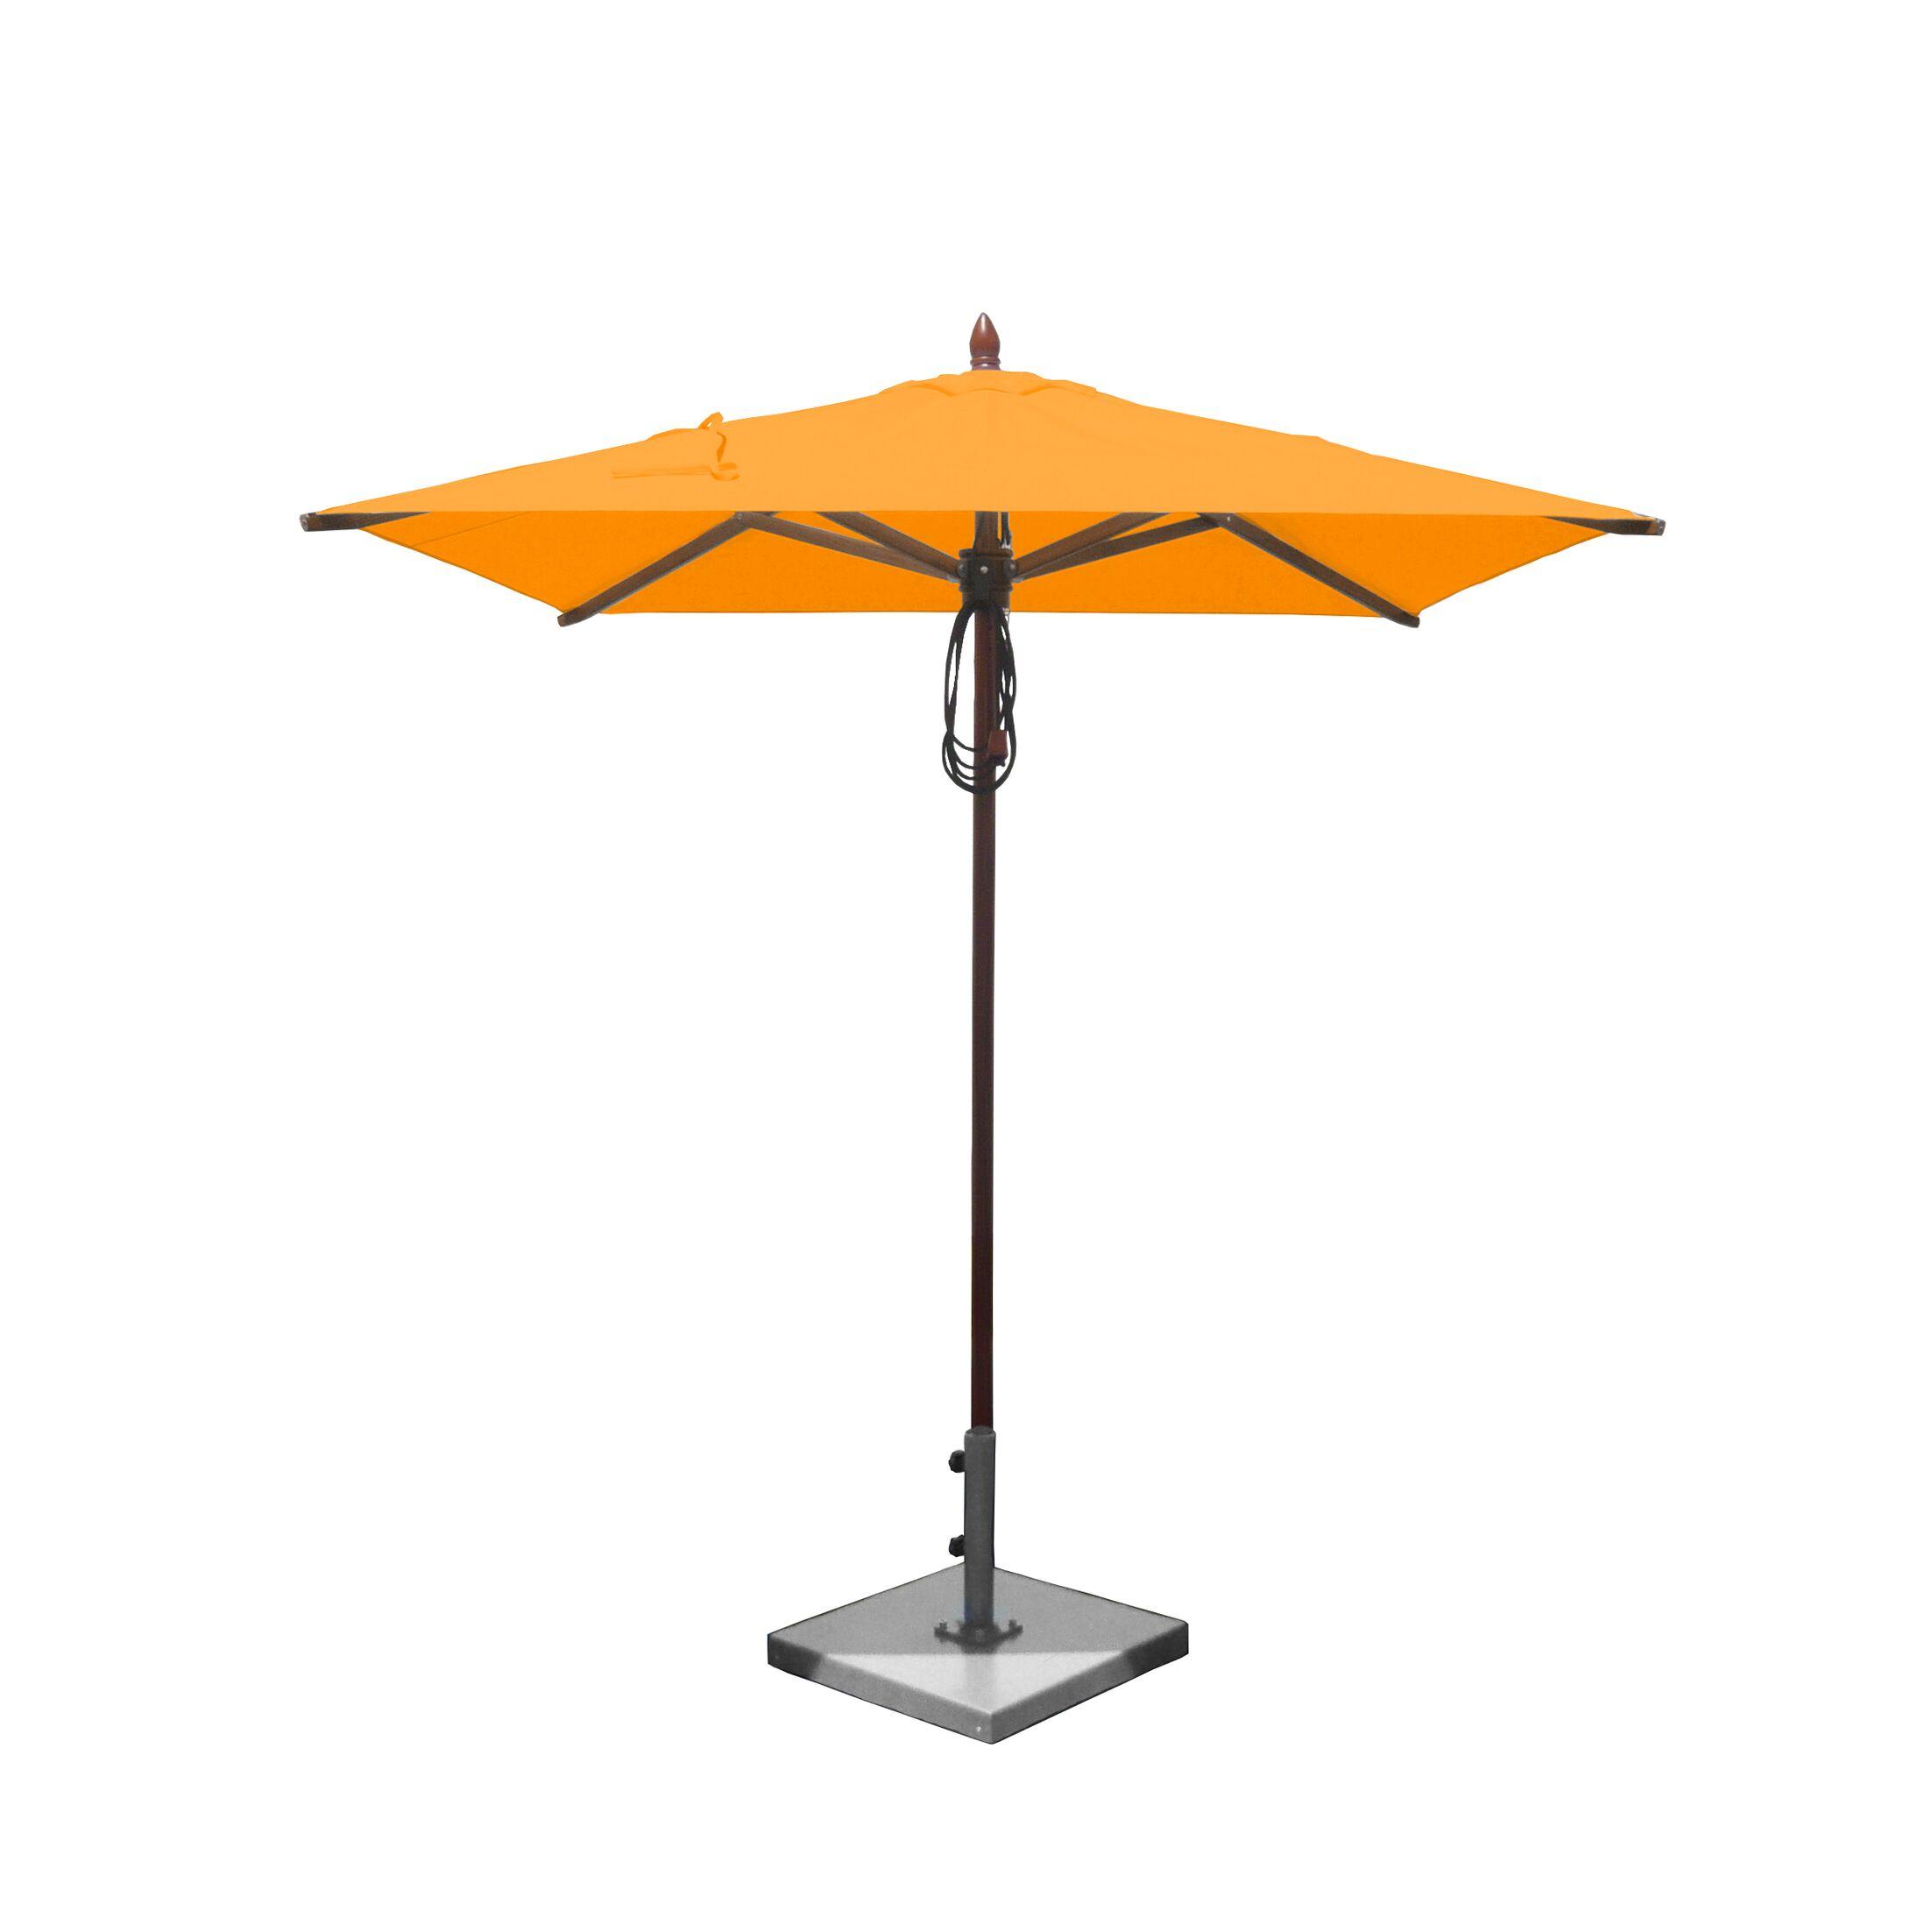 6.5' Square Market Umbrella Fabric: Sunflower Yellow